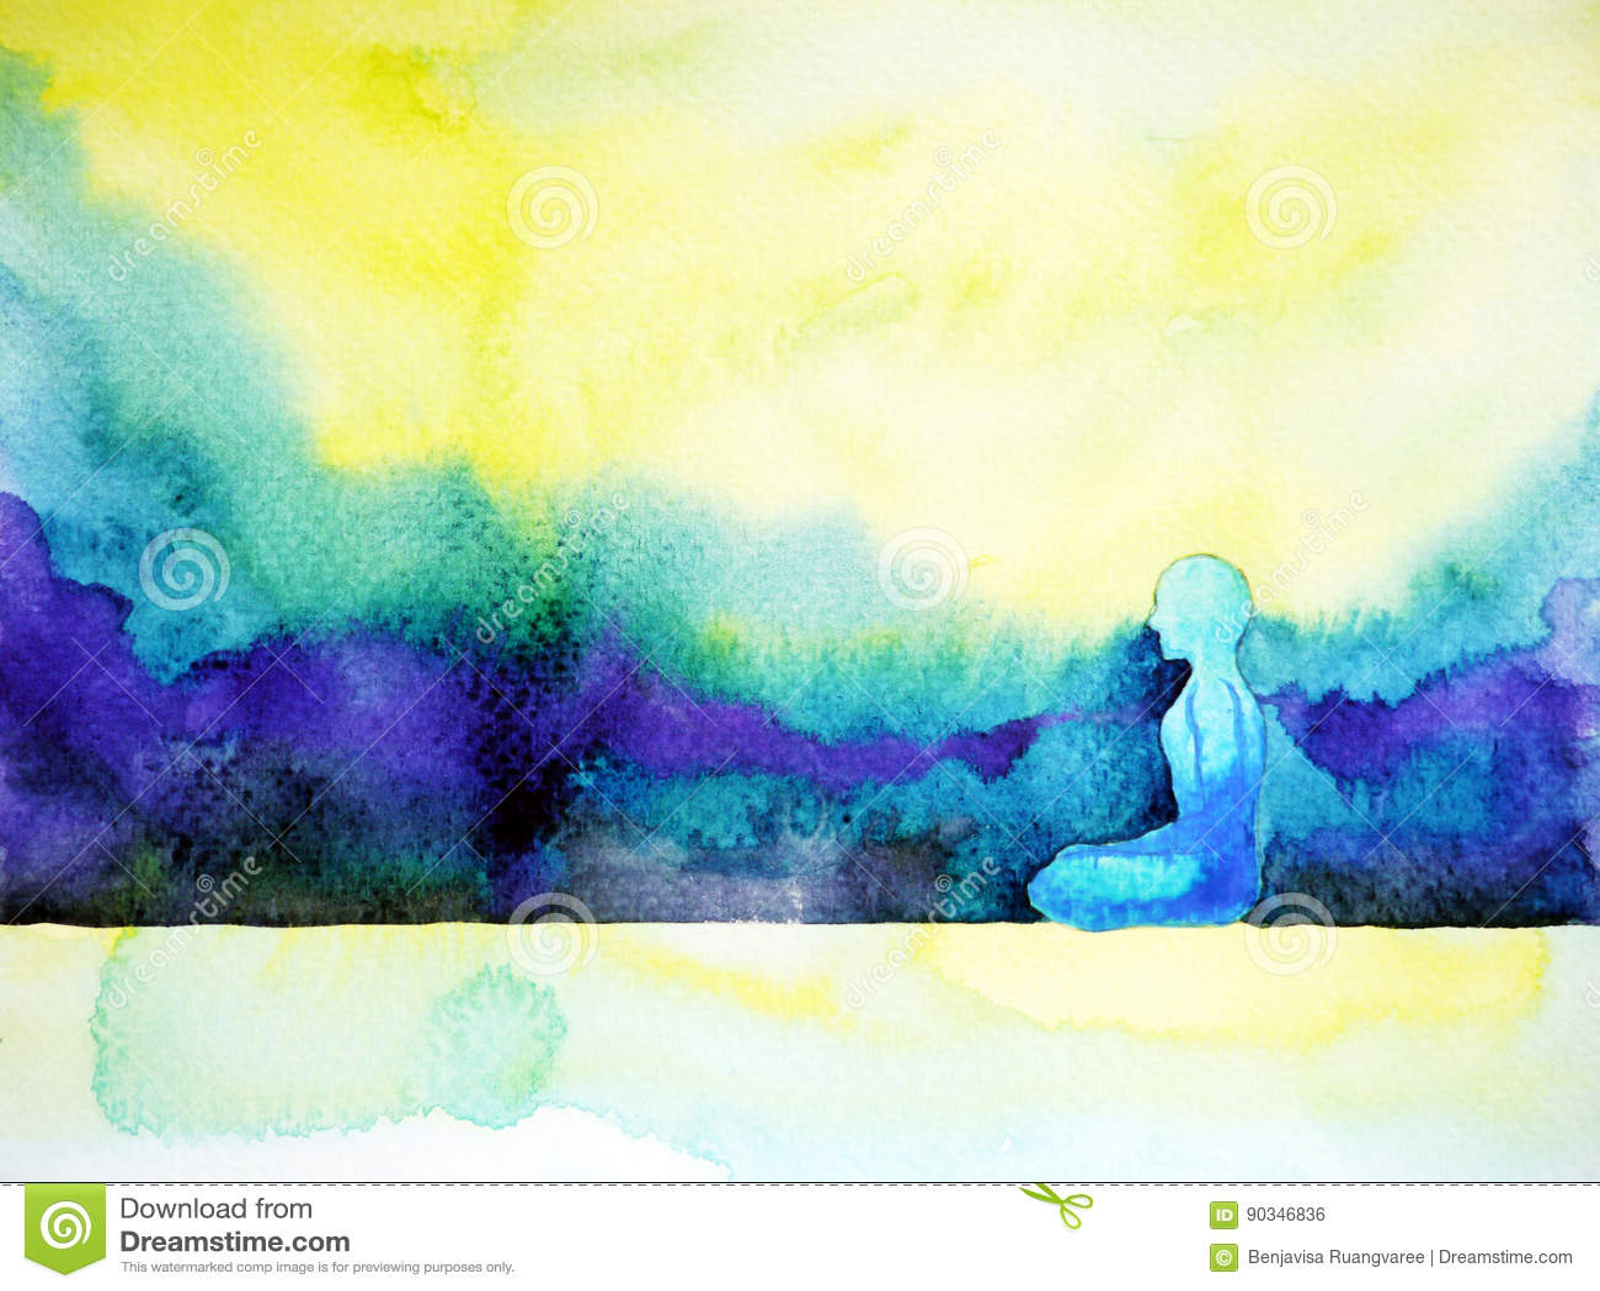 Abstract Art Watercolor Painting Human Meditating Calm Peace